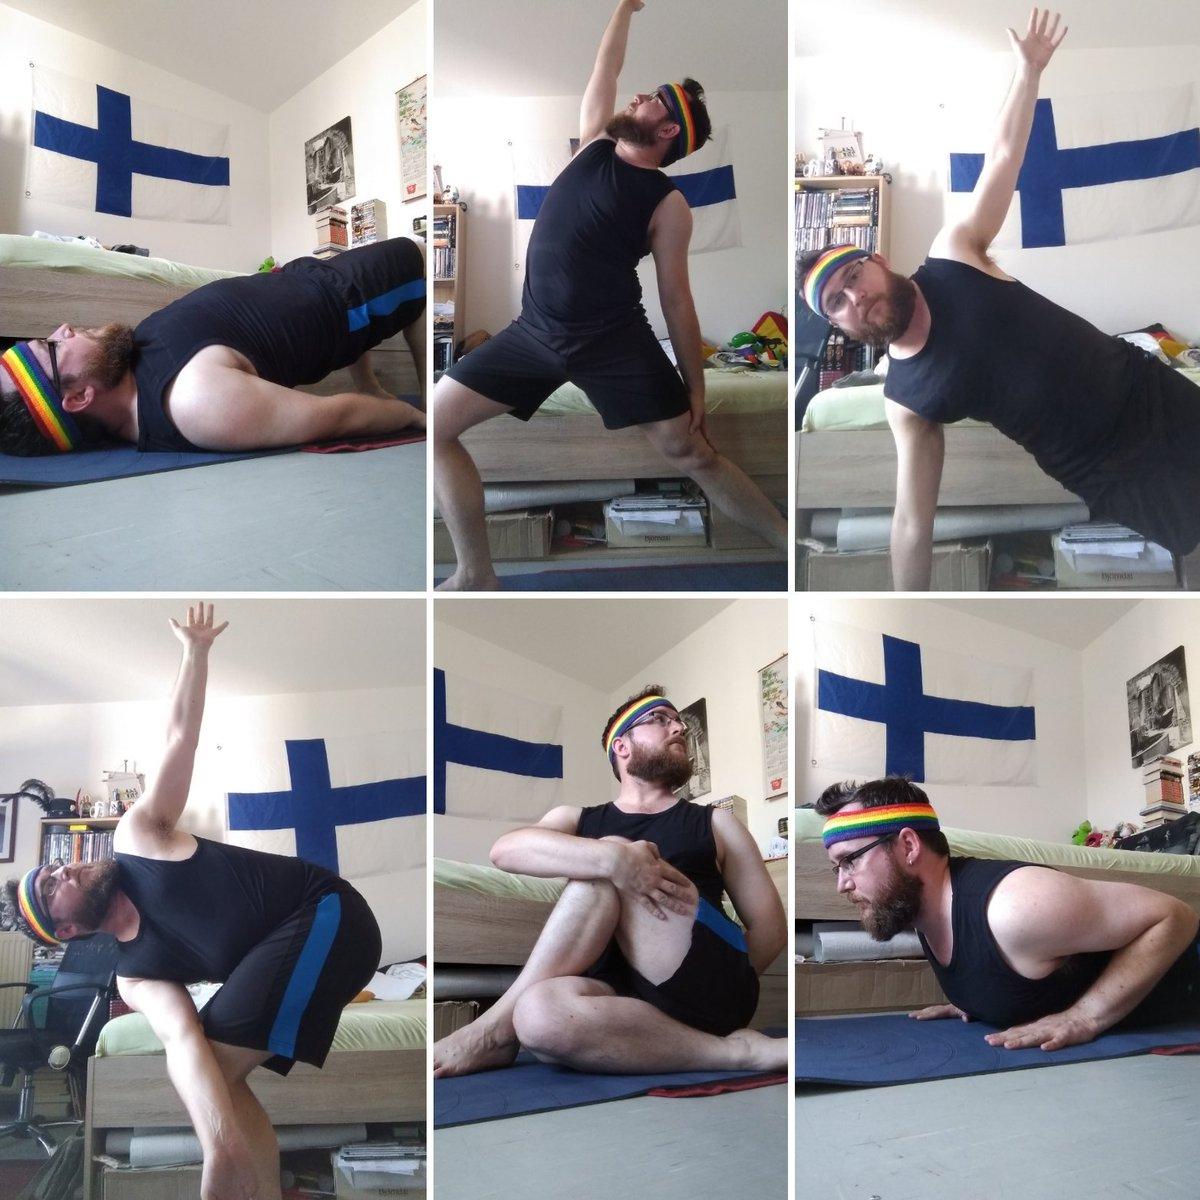 Good Morning! #Yoga before the heat outside also hits my home.  Namaste!  #asana #pose #sunrise #goodmorning #rainbow #sportyspice #spiceboy Motivation by @MelanieCmusic https://t.co/RxJbphb0v4